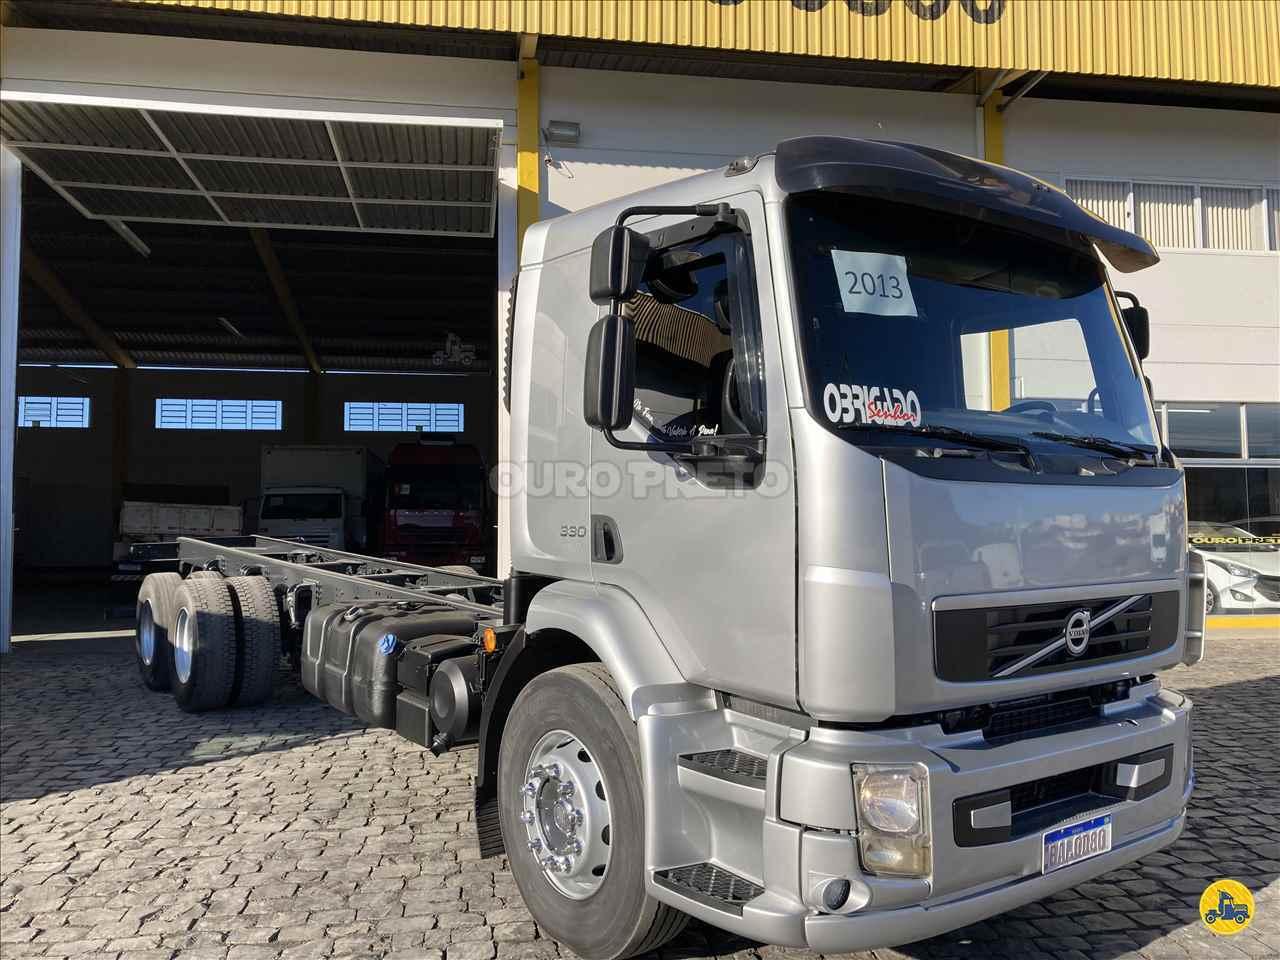 CAMINHAO VOLVO VOLVO VM 330 Chassis Truck 6x2 Ouro Preto Caminhões LAGES SANTA CATARINA SC